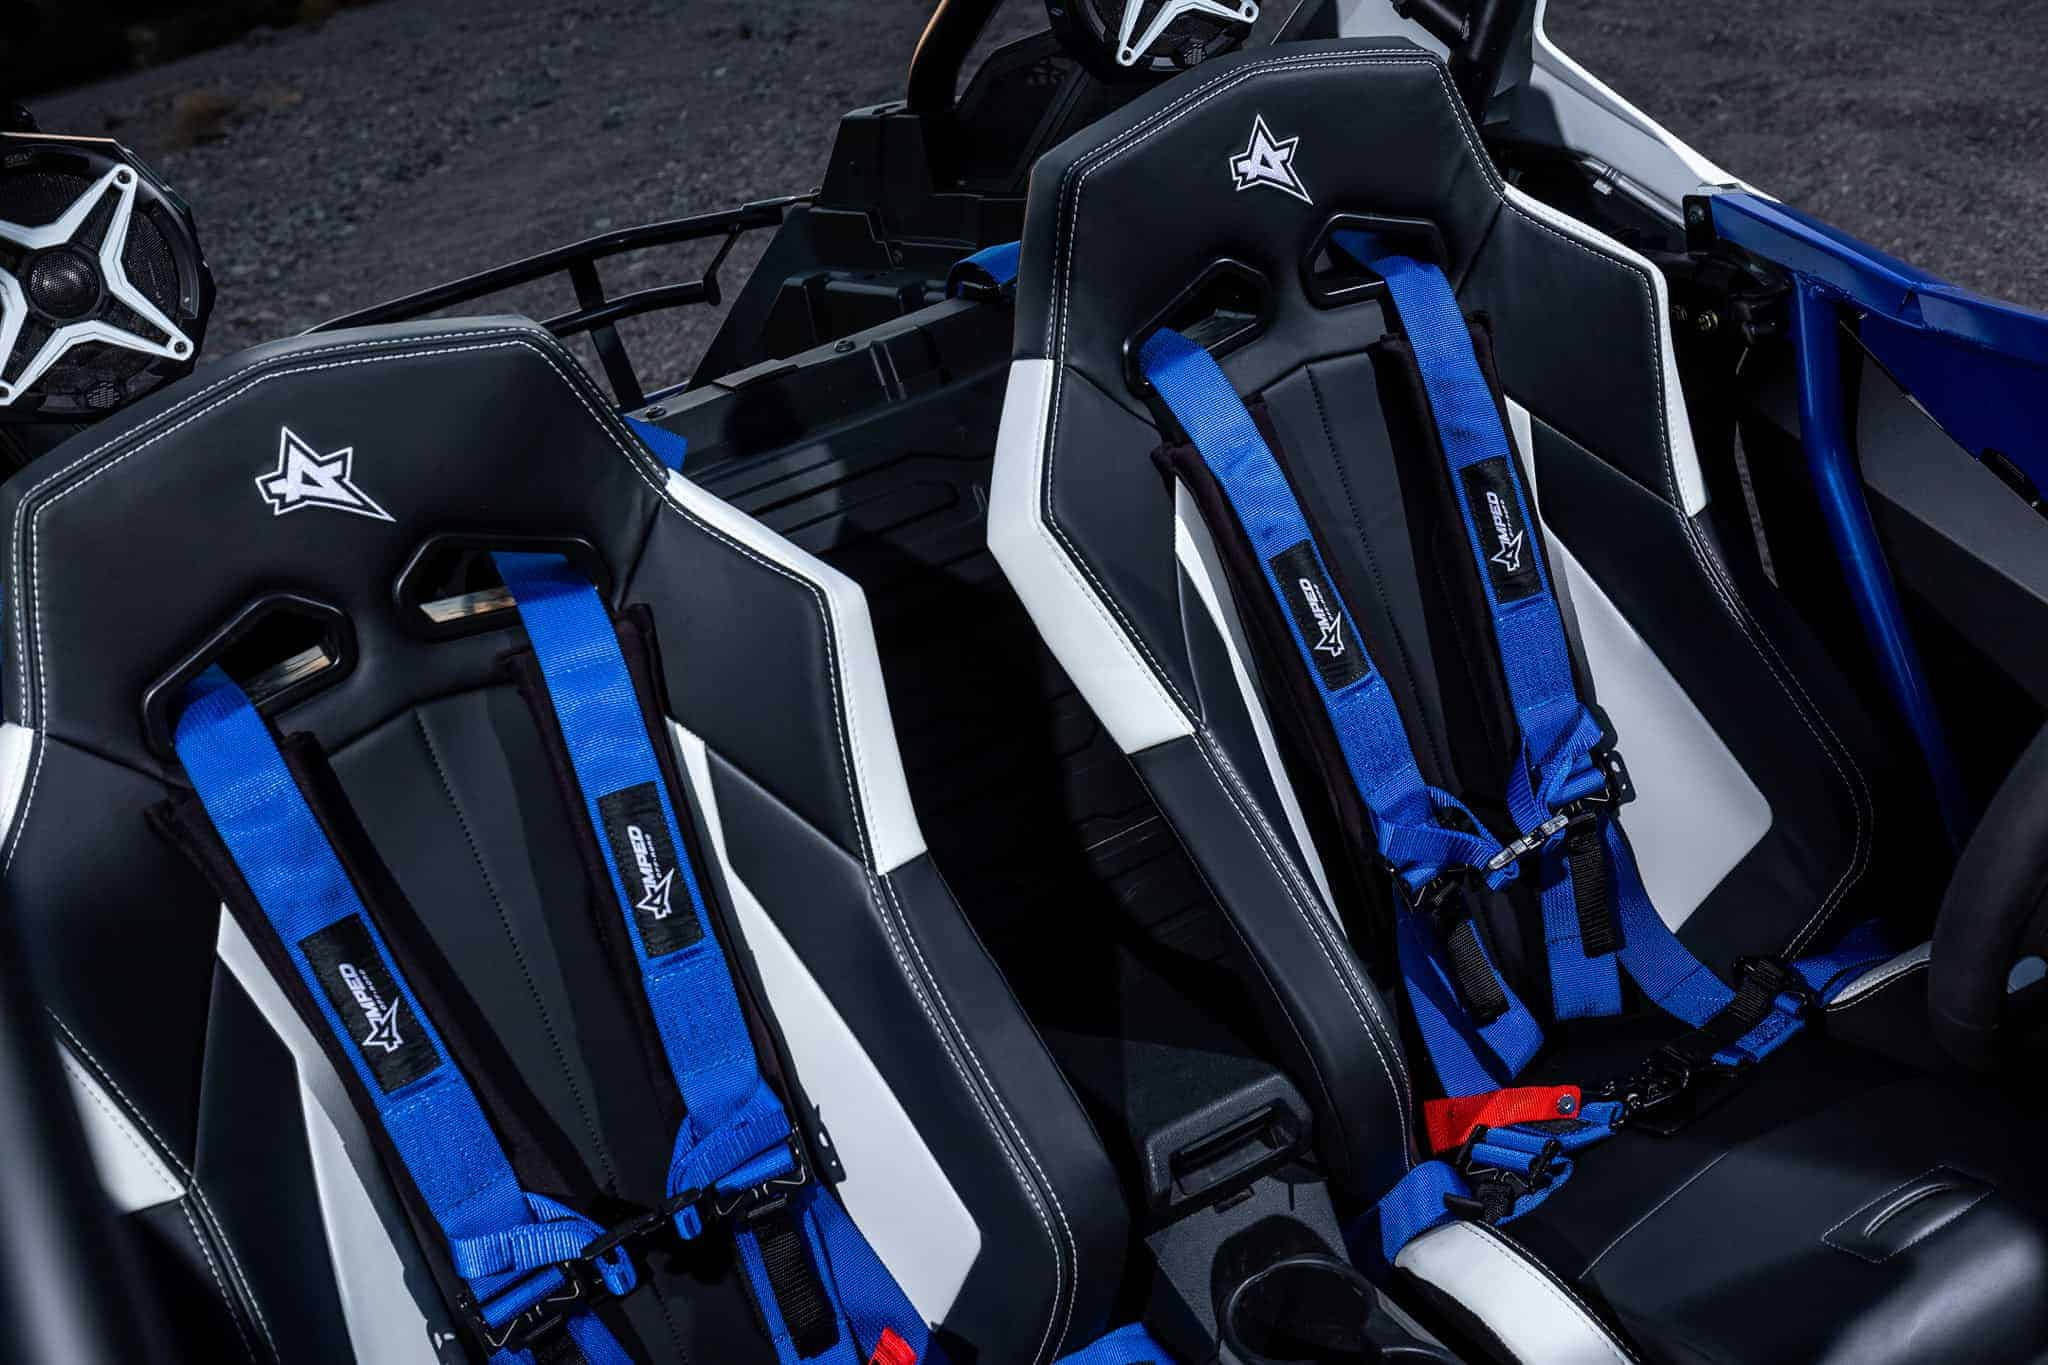 Performance Utv Seats, Full Suspension